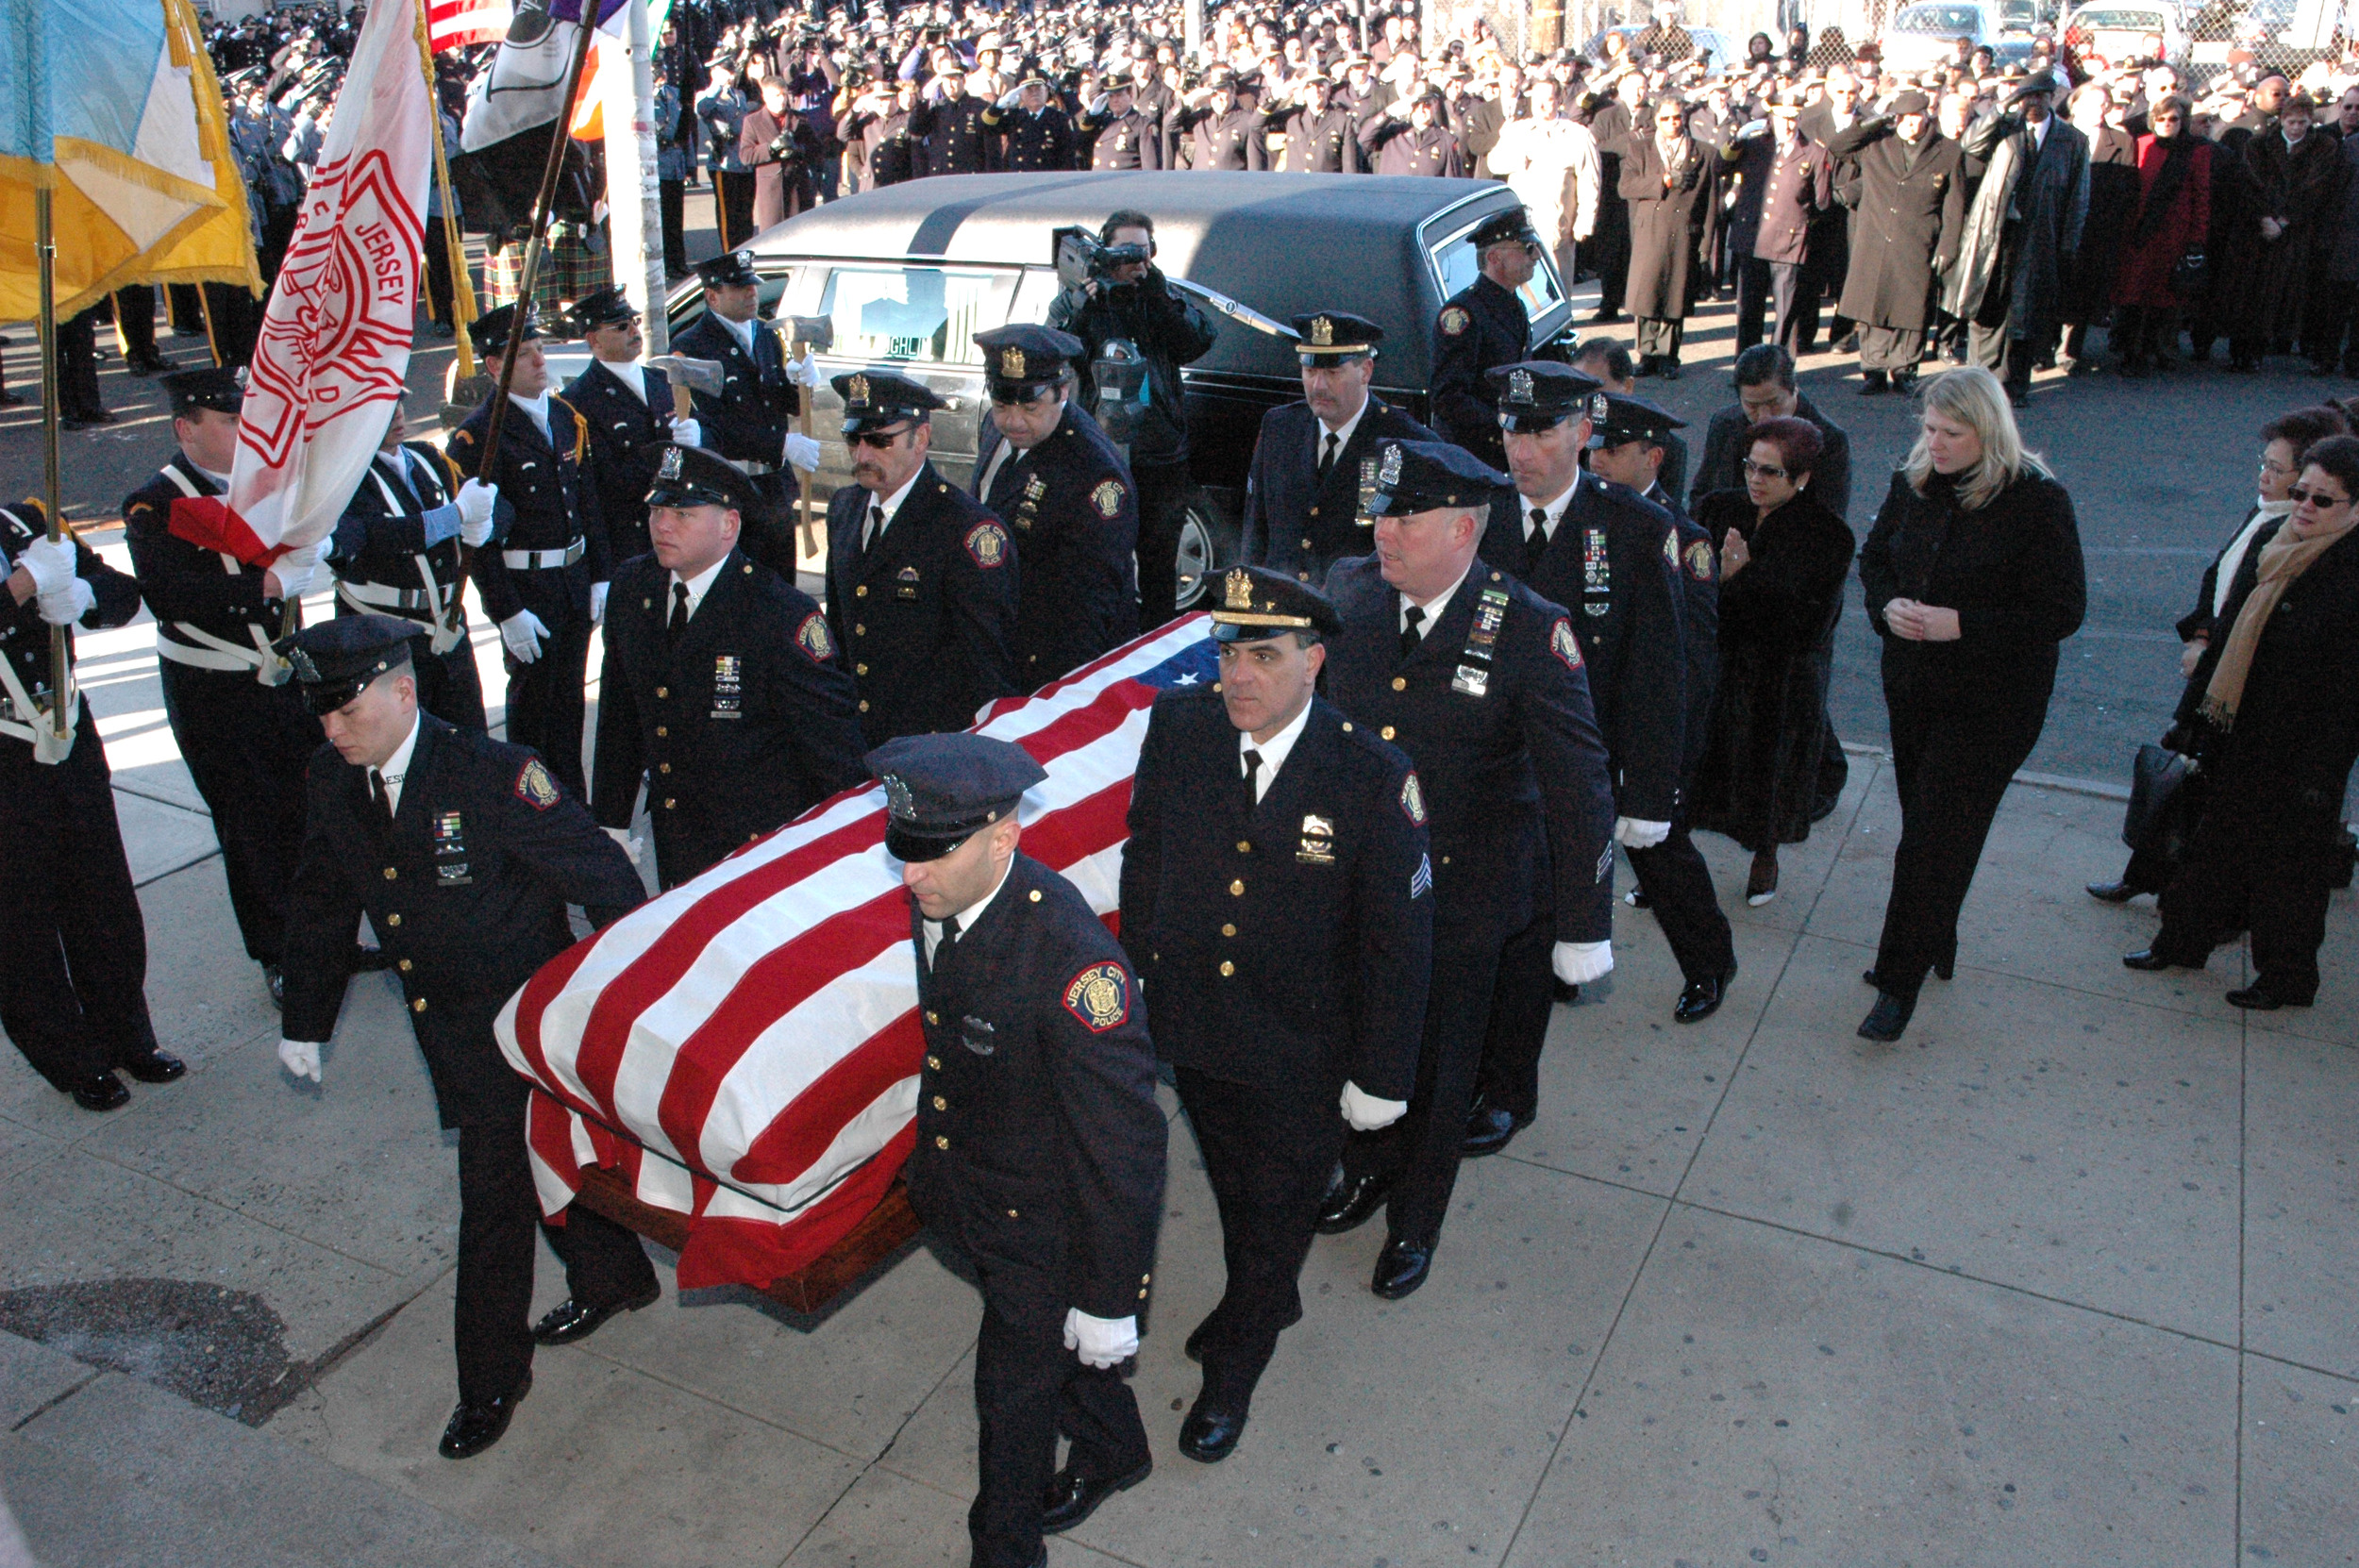 New York Post 01.07.06 Deceased Jersey City Police Officer.jpg